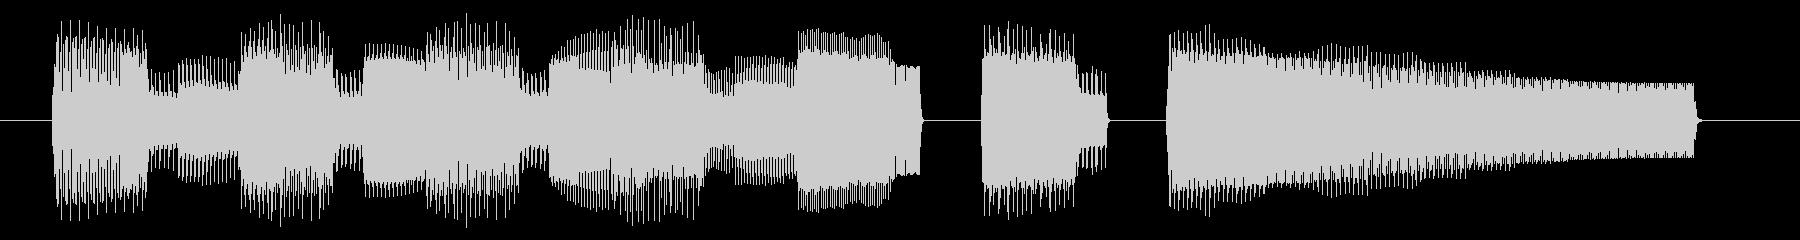 NES 和風 A06-2(クリア2)の未再生の波形